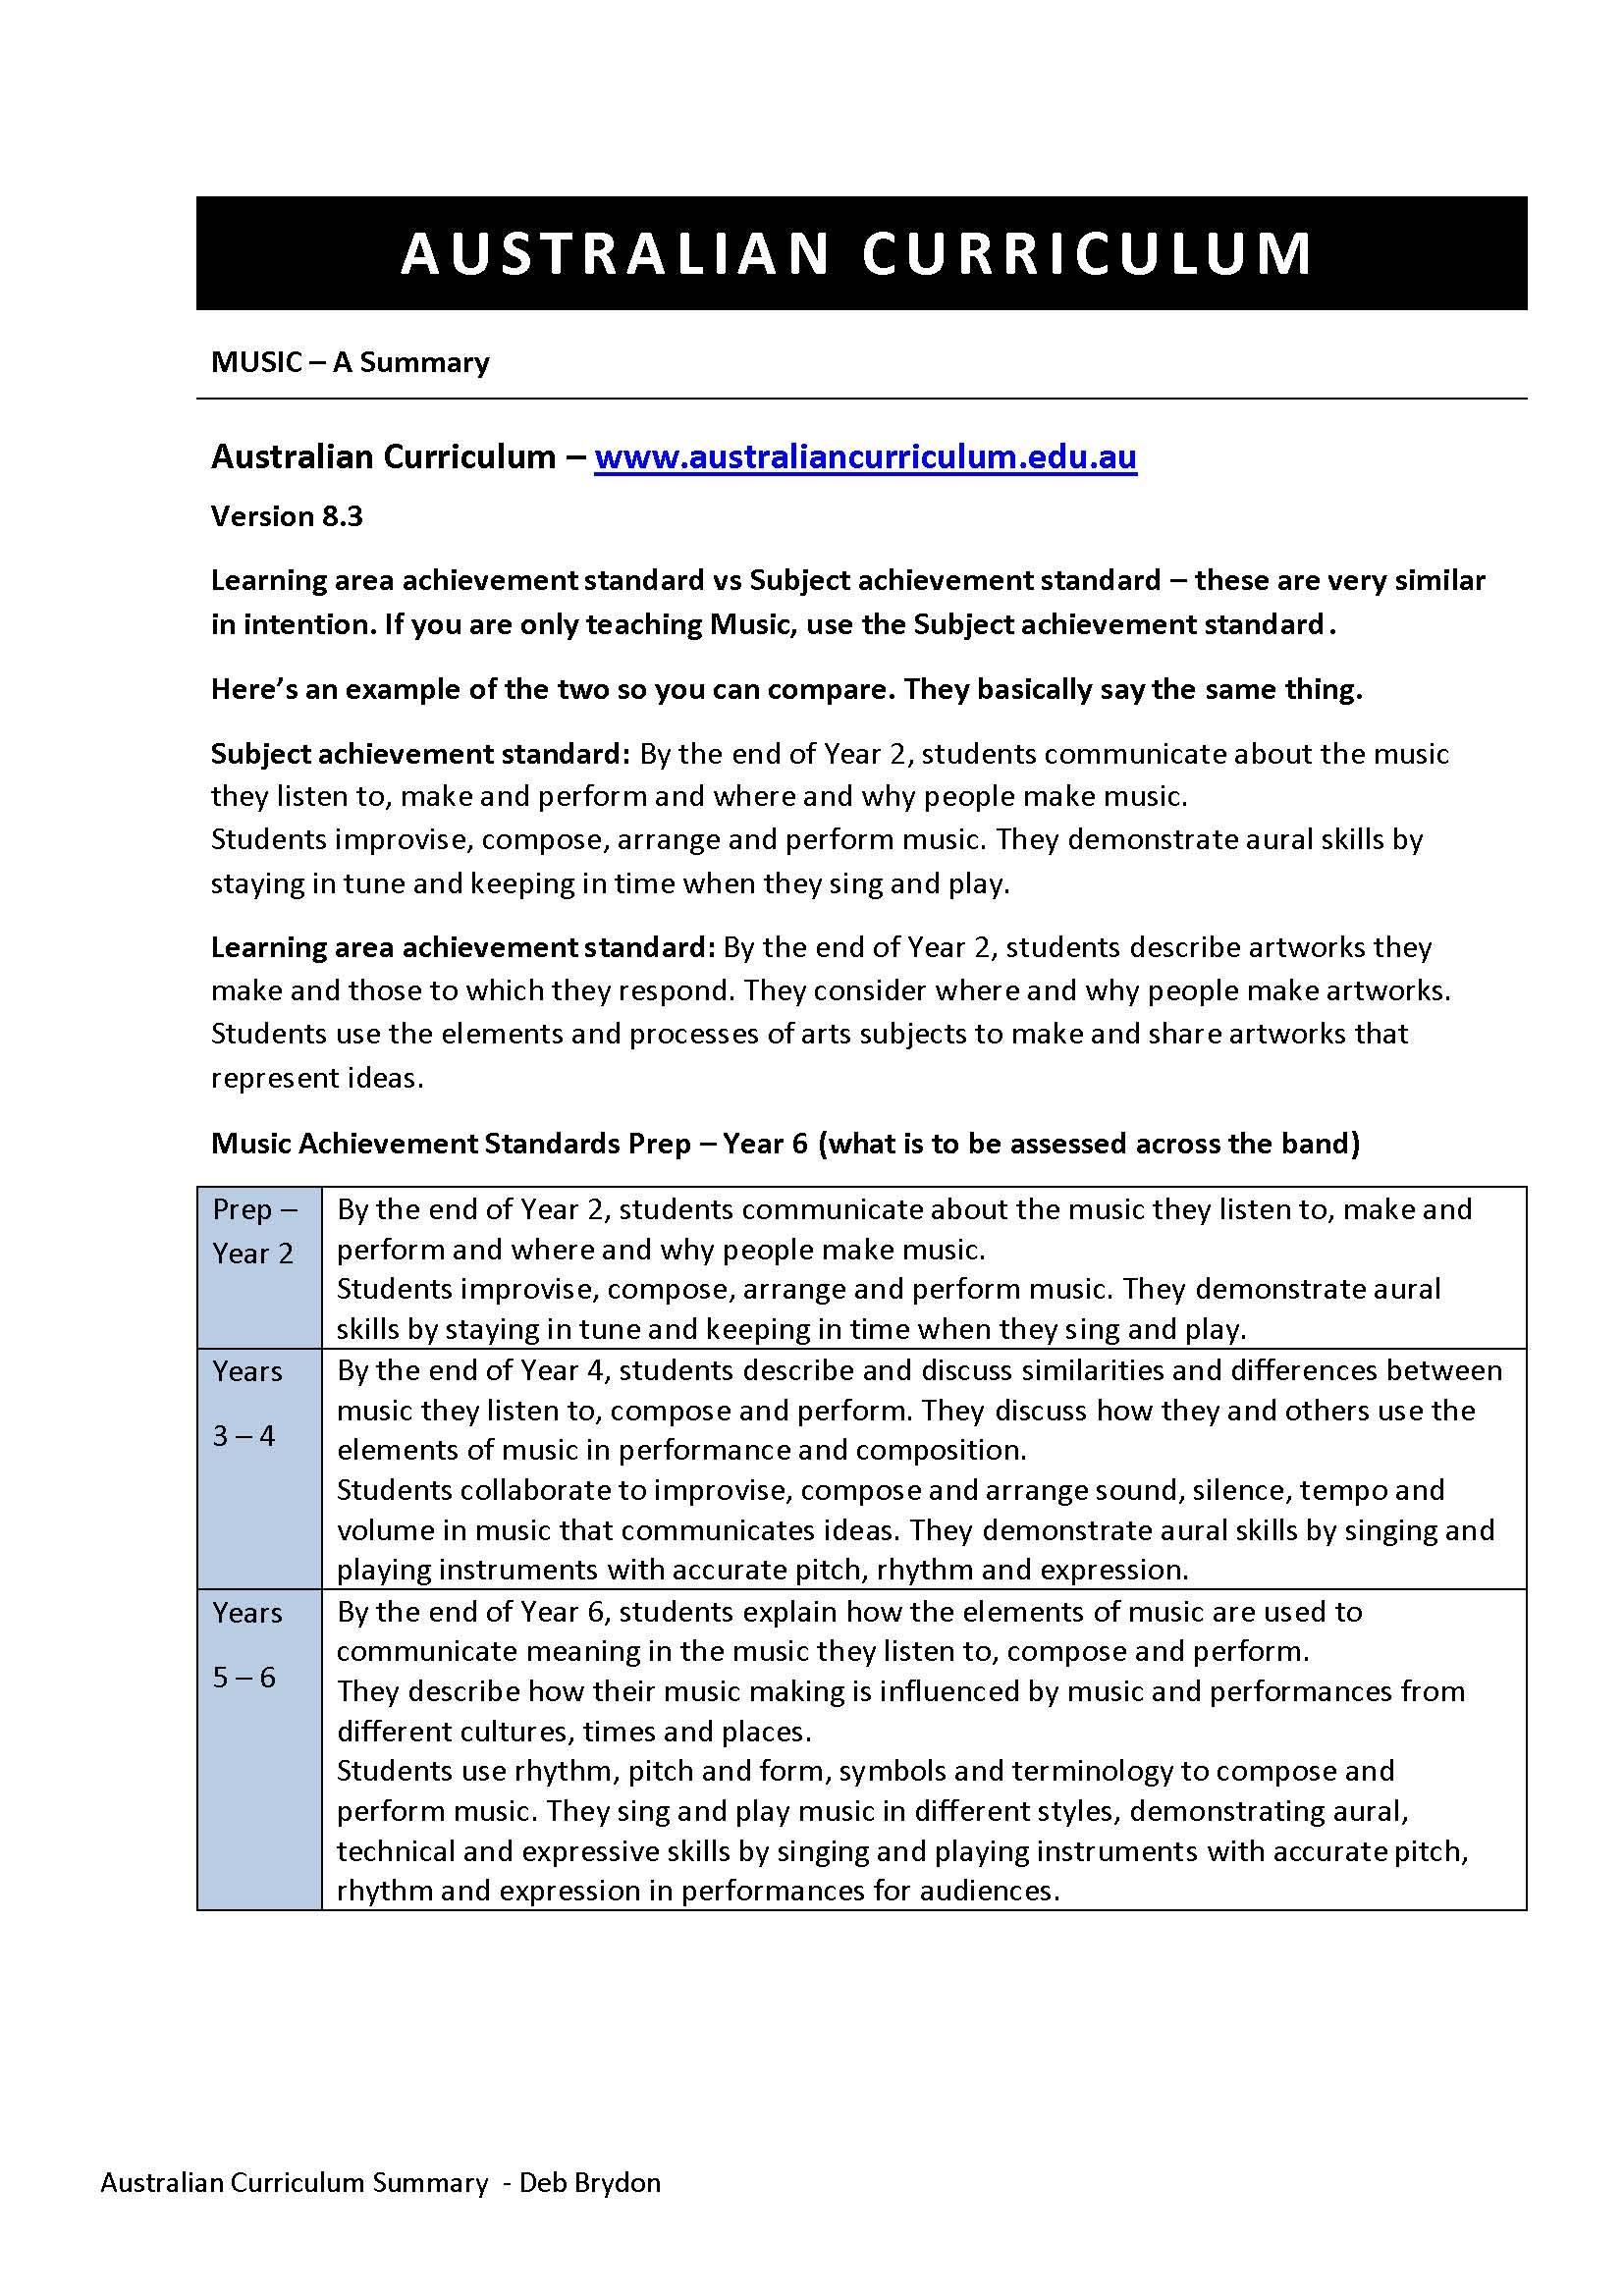 Australian_Curriculum_Summary_Page_1